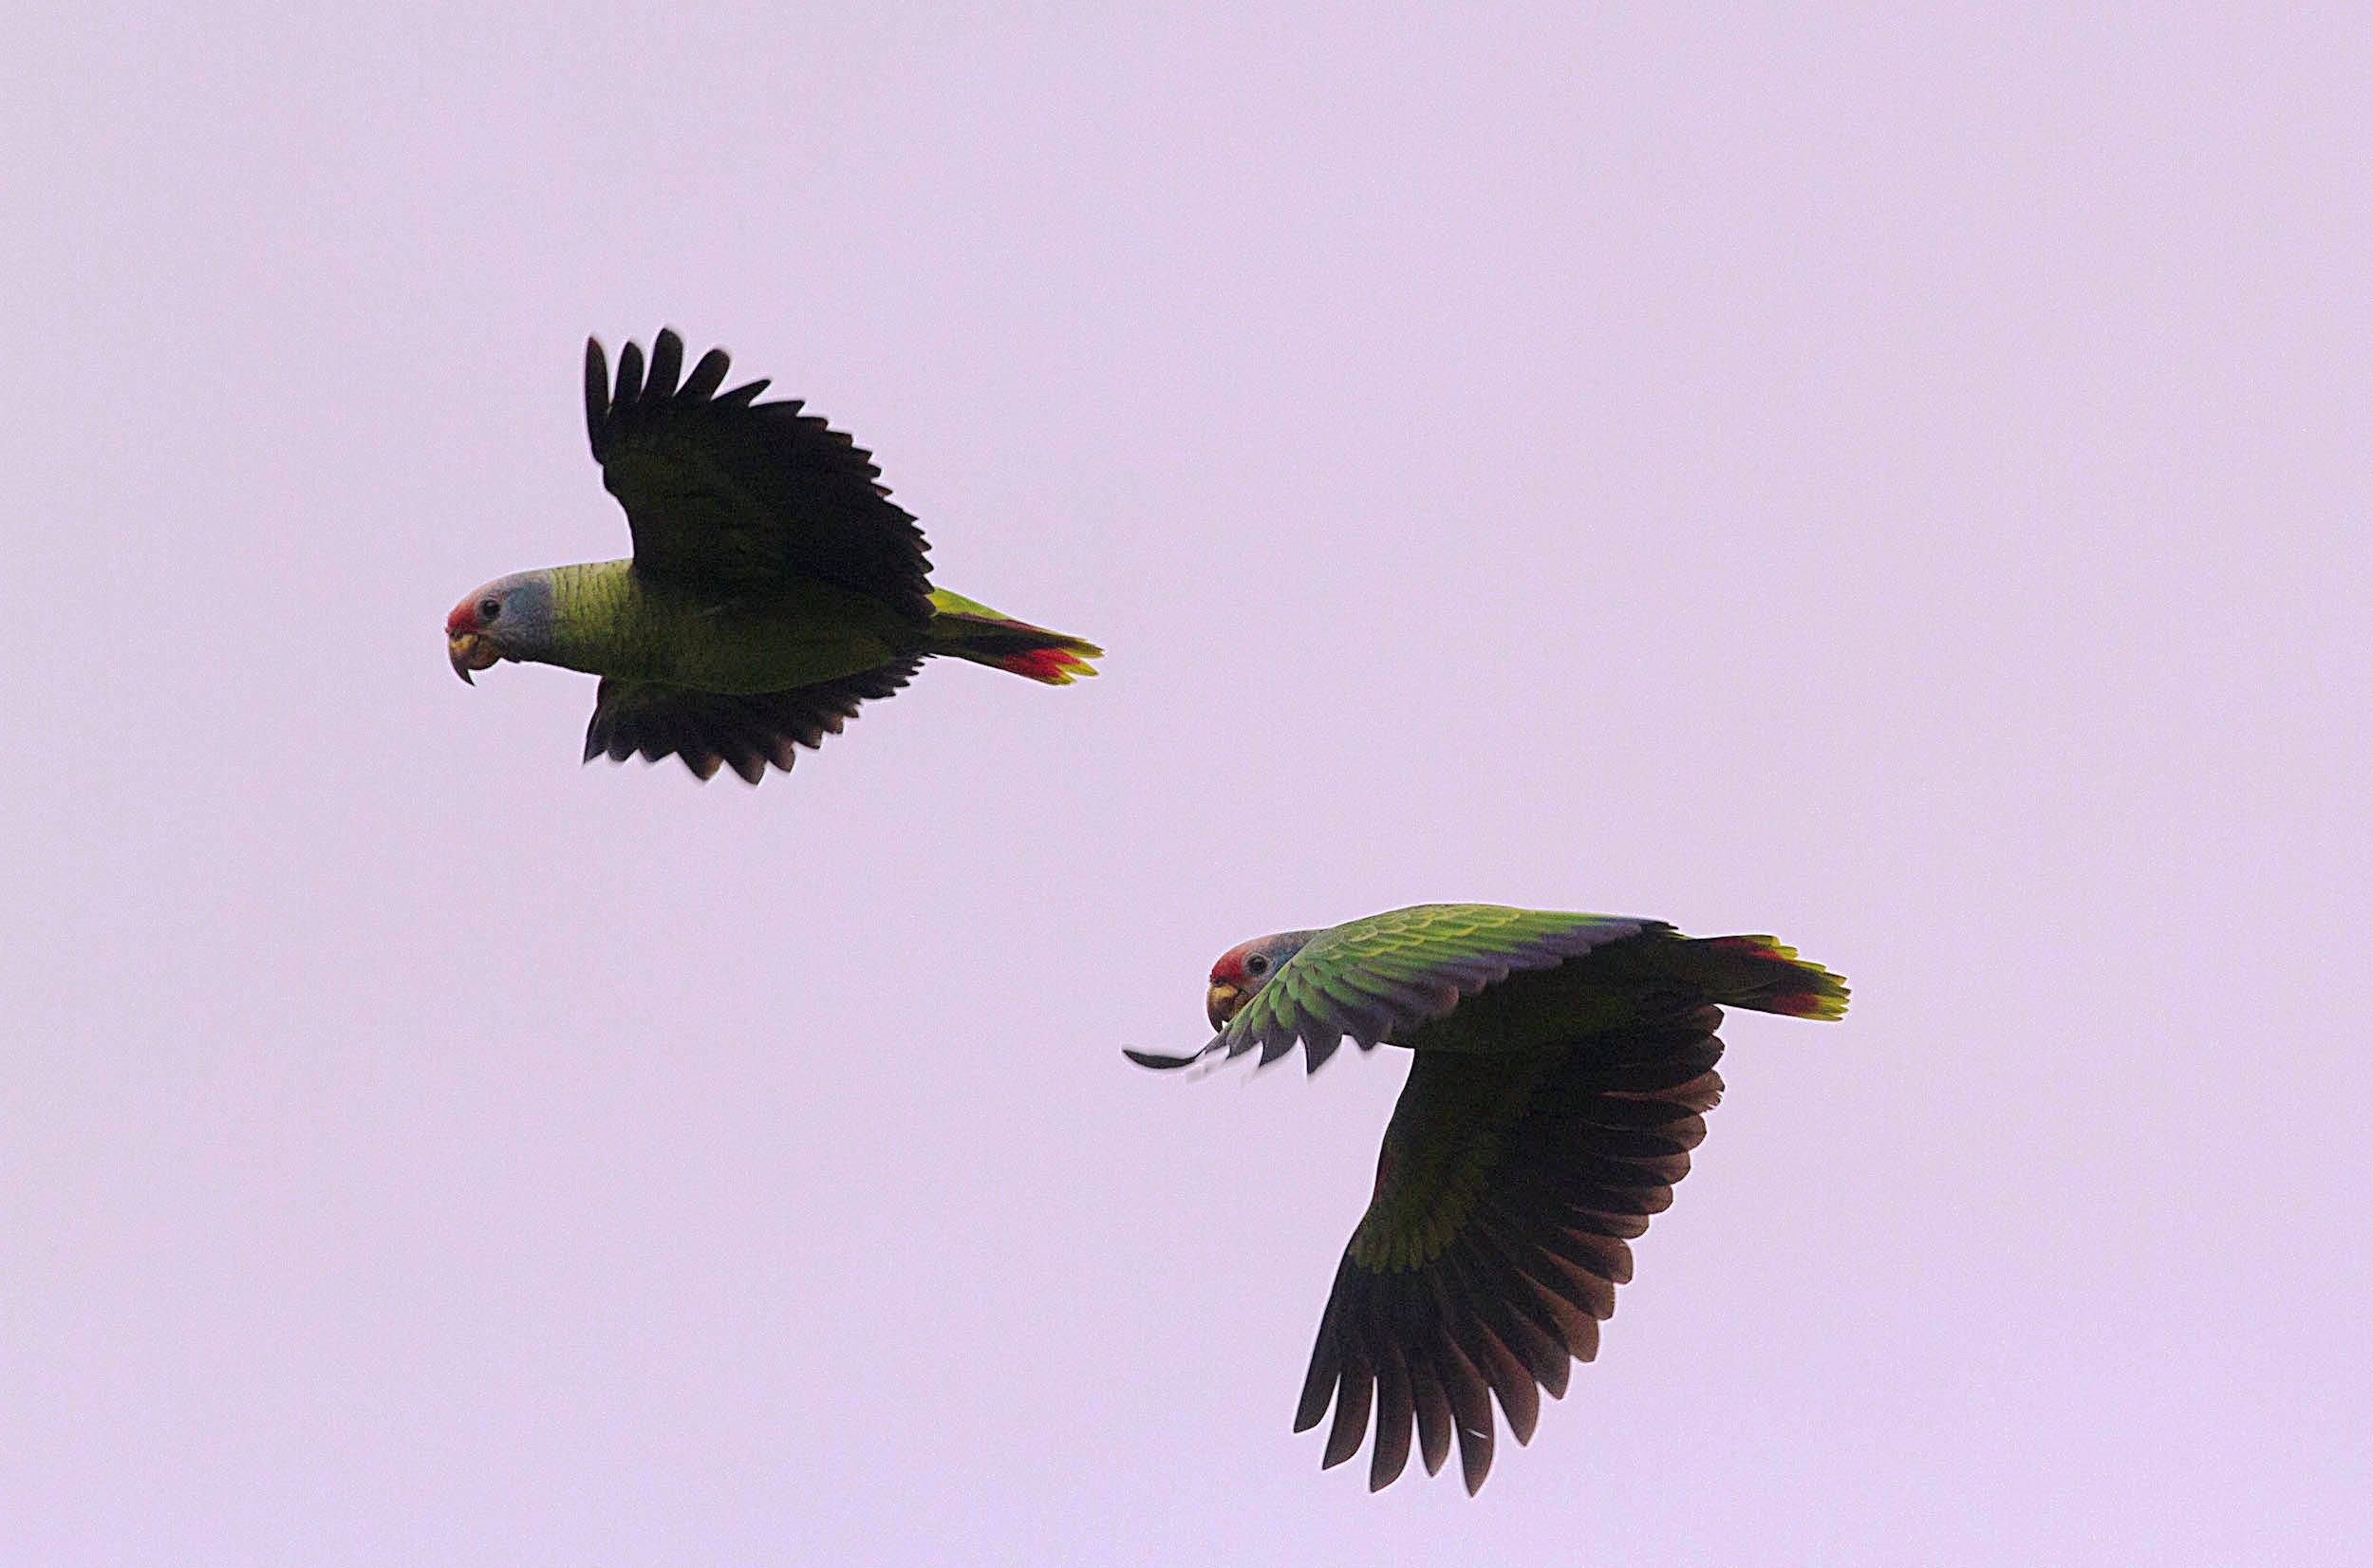 Casal de Papagaios-de-cara-roxa (Amazona brasiliensis). Foto: Fabio Schunck